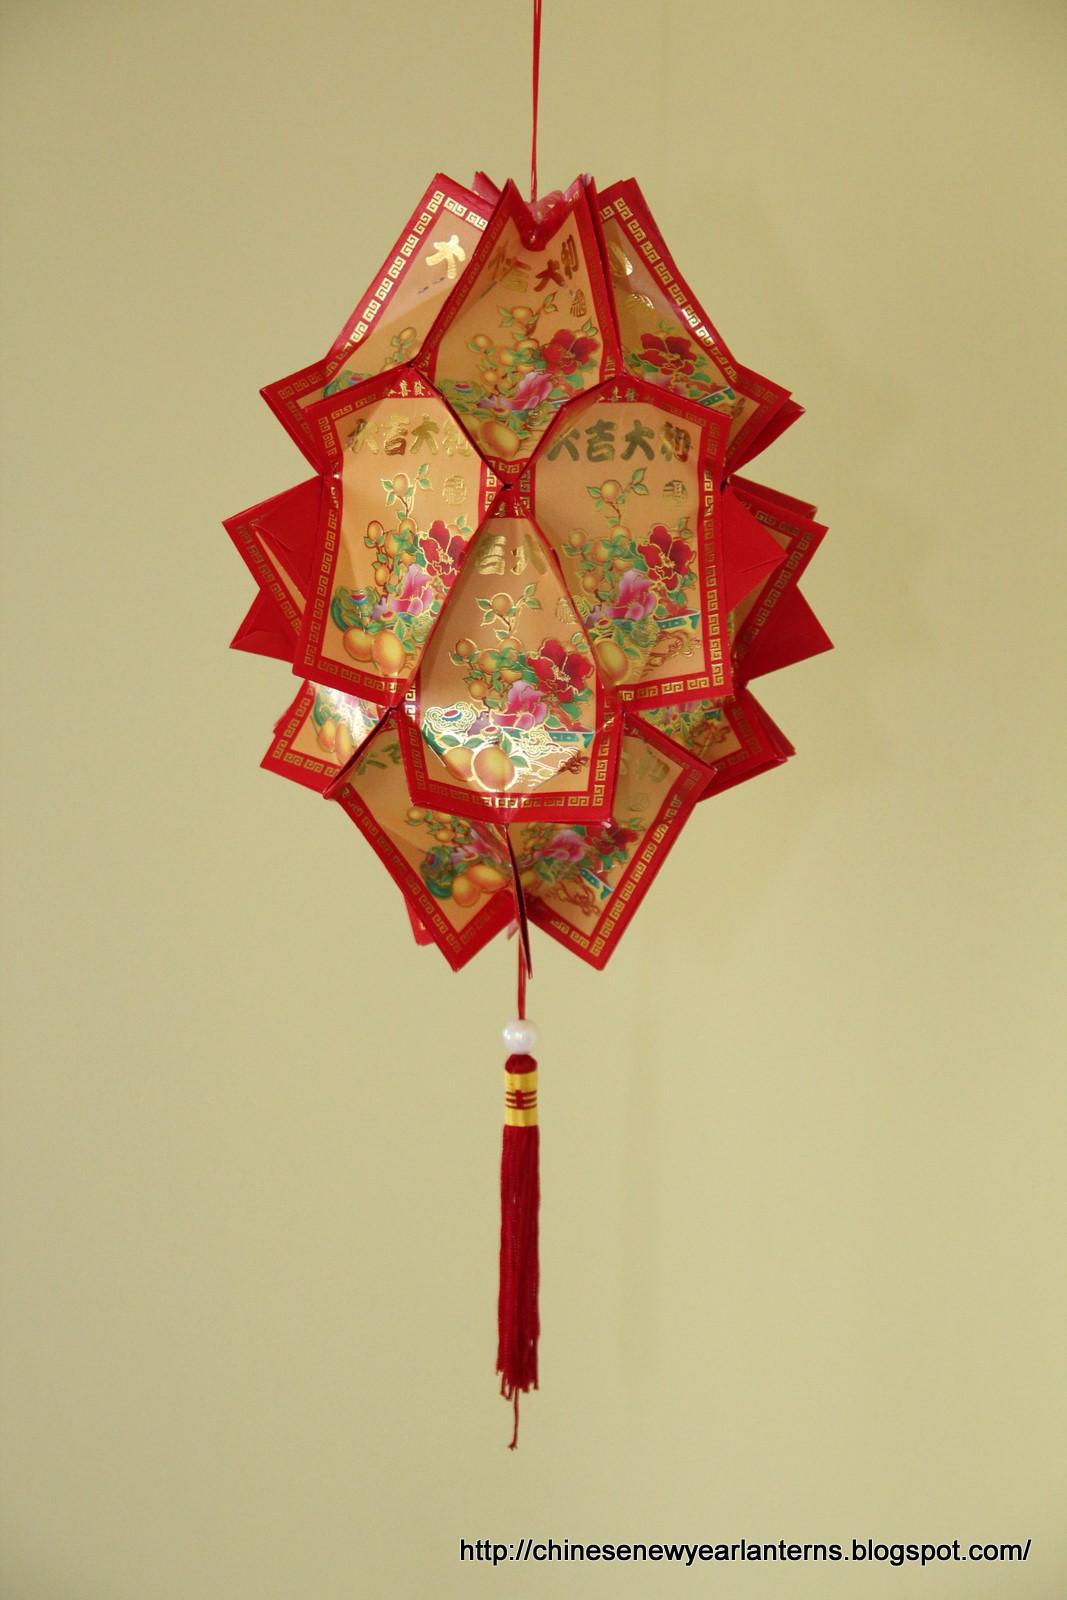 Chinese New Year Lanterns 红包灯笼手工制作: How to make a Lamp ...